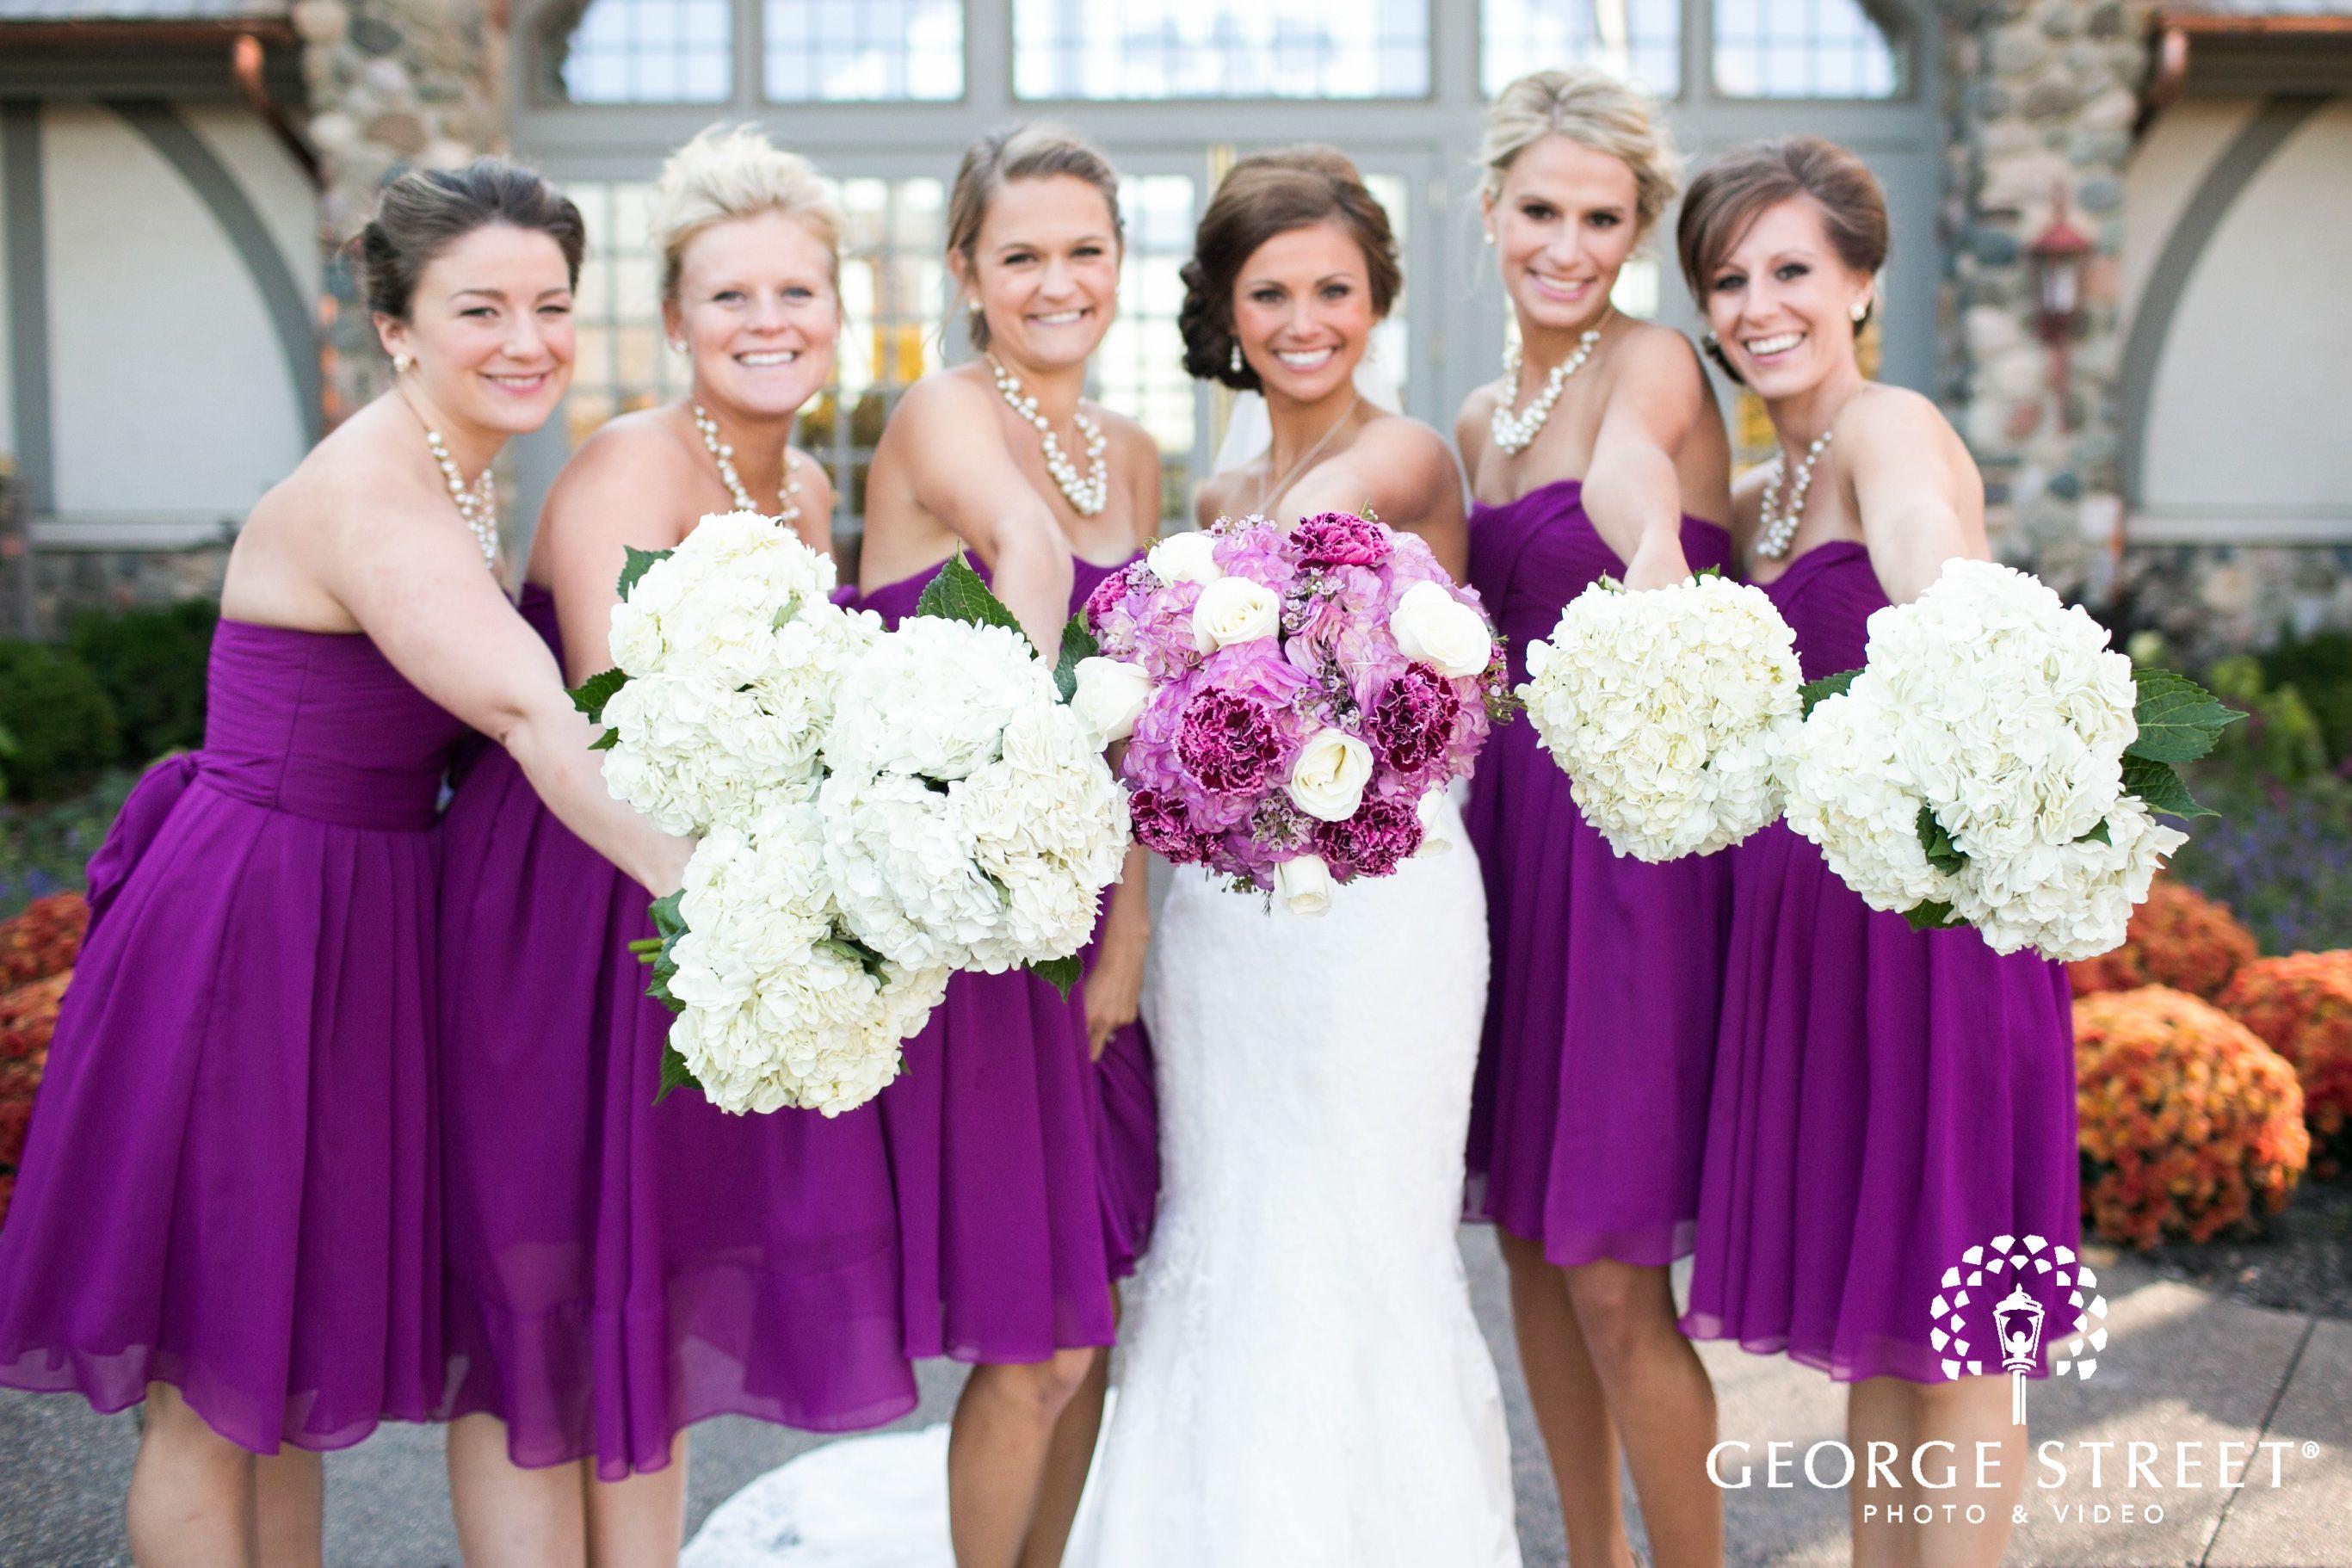 Rush Creek Wedding dresses, Bridesmaid dresses, Wedding